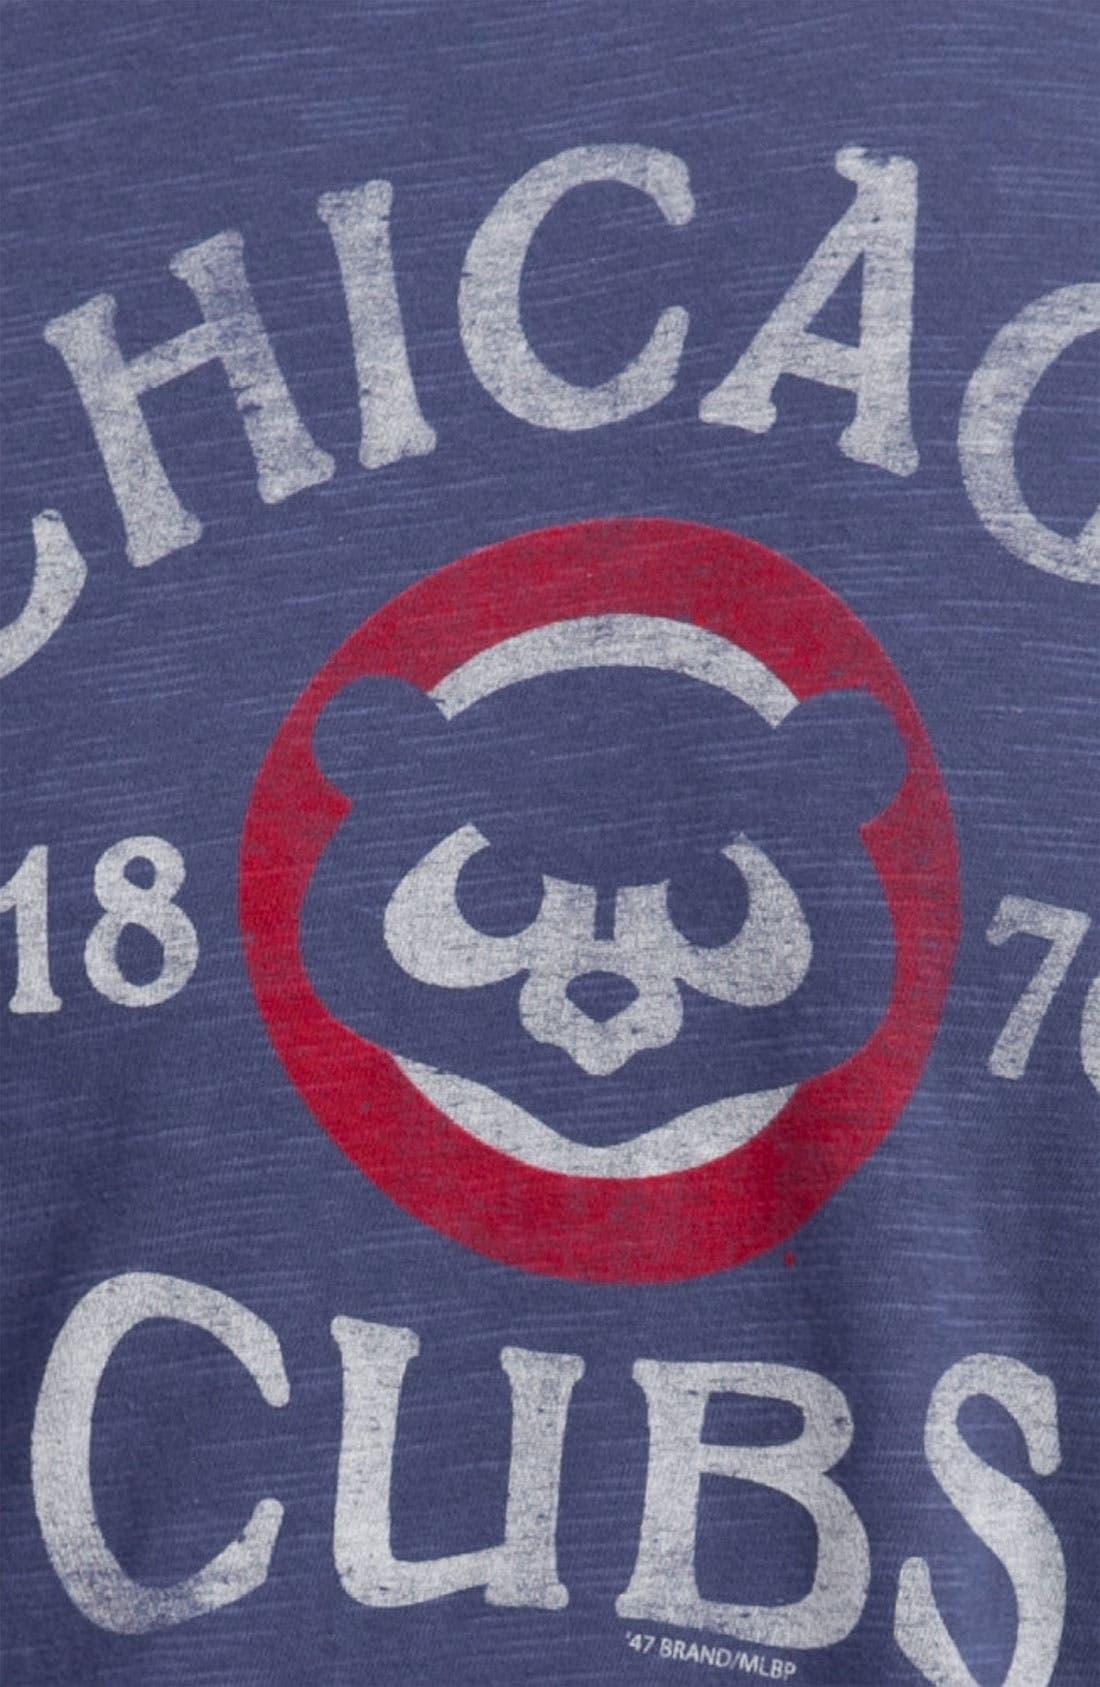 'Chicago Cubs' Regular Fit Crewneck T-Shirt,                             Alternate thumbnail 34, color,